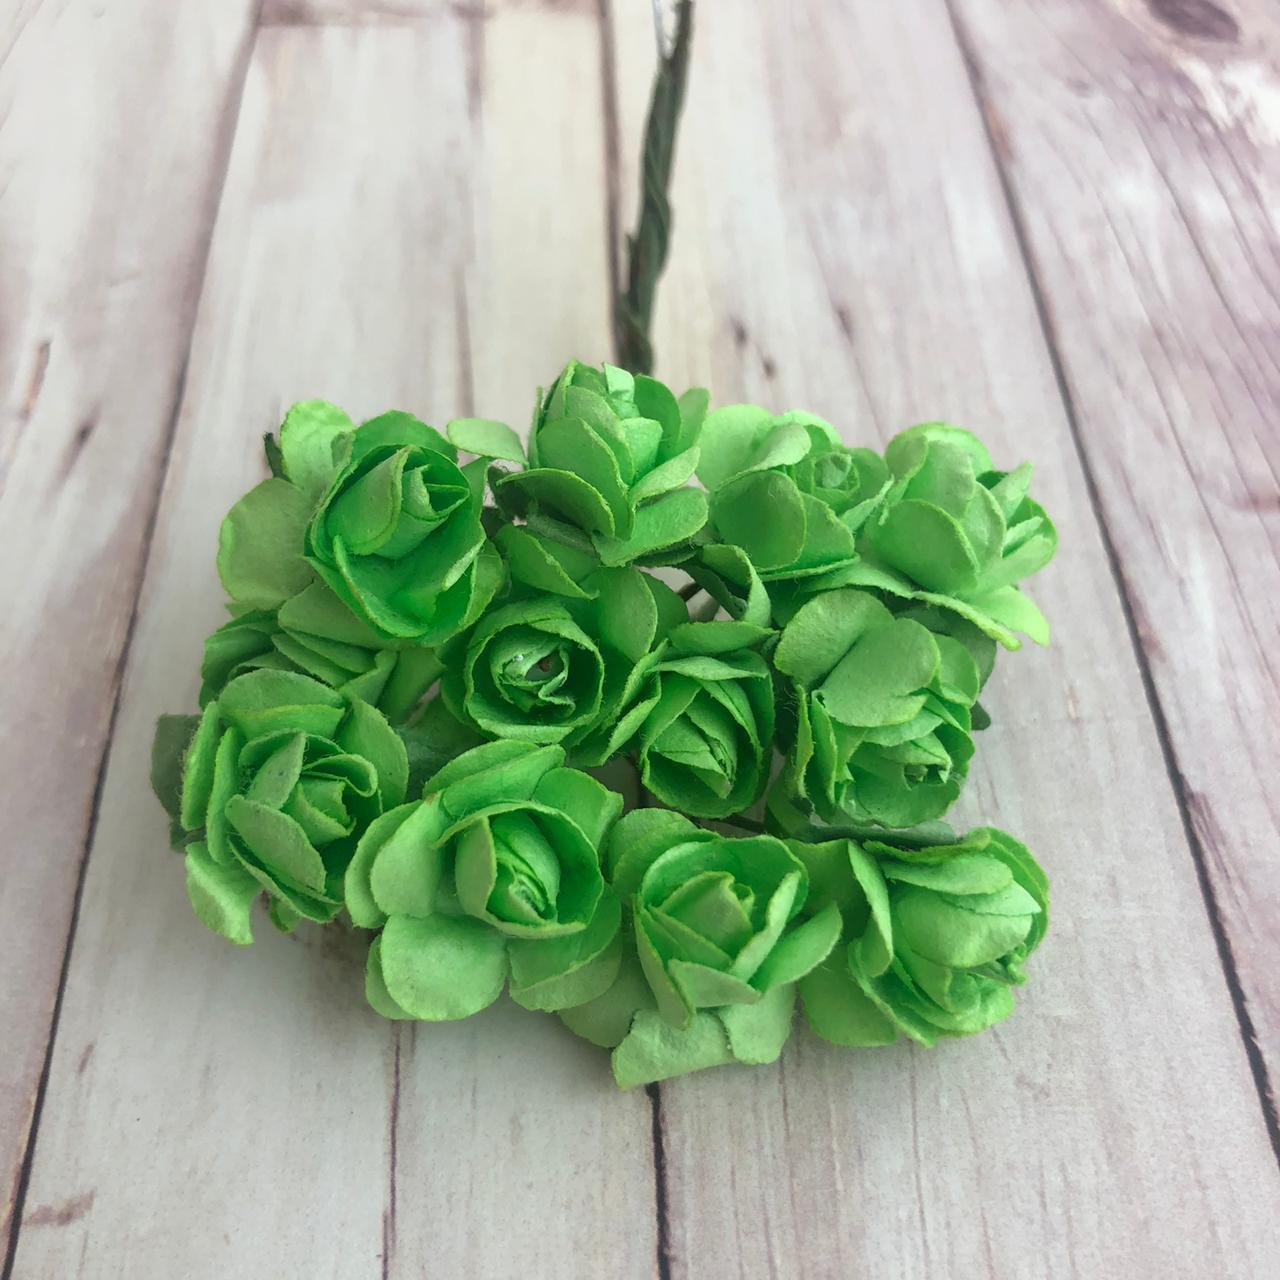 Mói de flor - verde (MF-01)